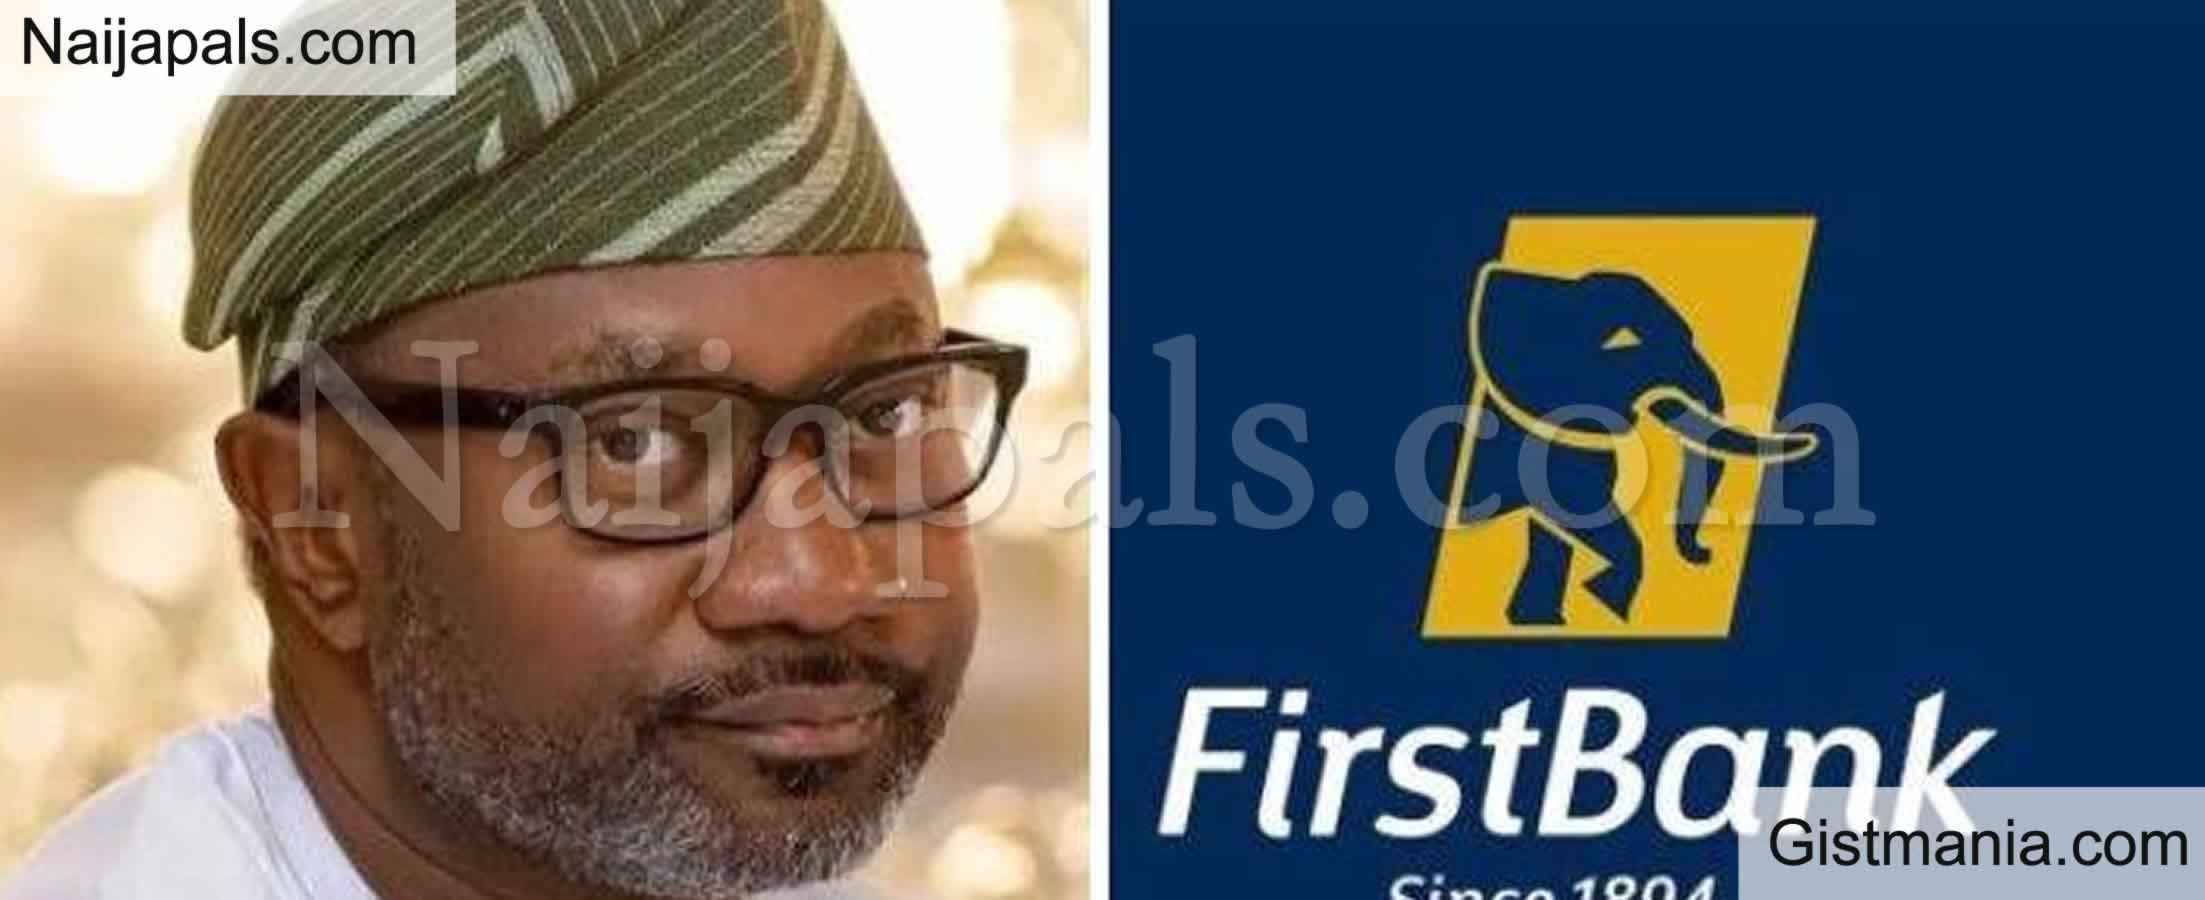 <img alt='.' class='lazyload' data-src='https://img.gistmania.com/emot/thumbs_up.gif' /> <b>Nigerian Billionaire, Femi Otedola Emerges Majority Shareholder Of First Bank Holdings</b>